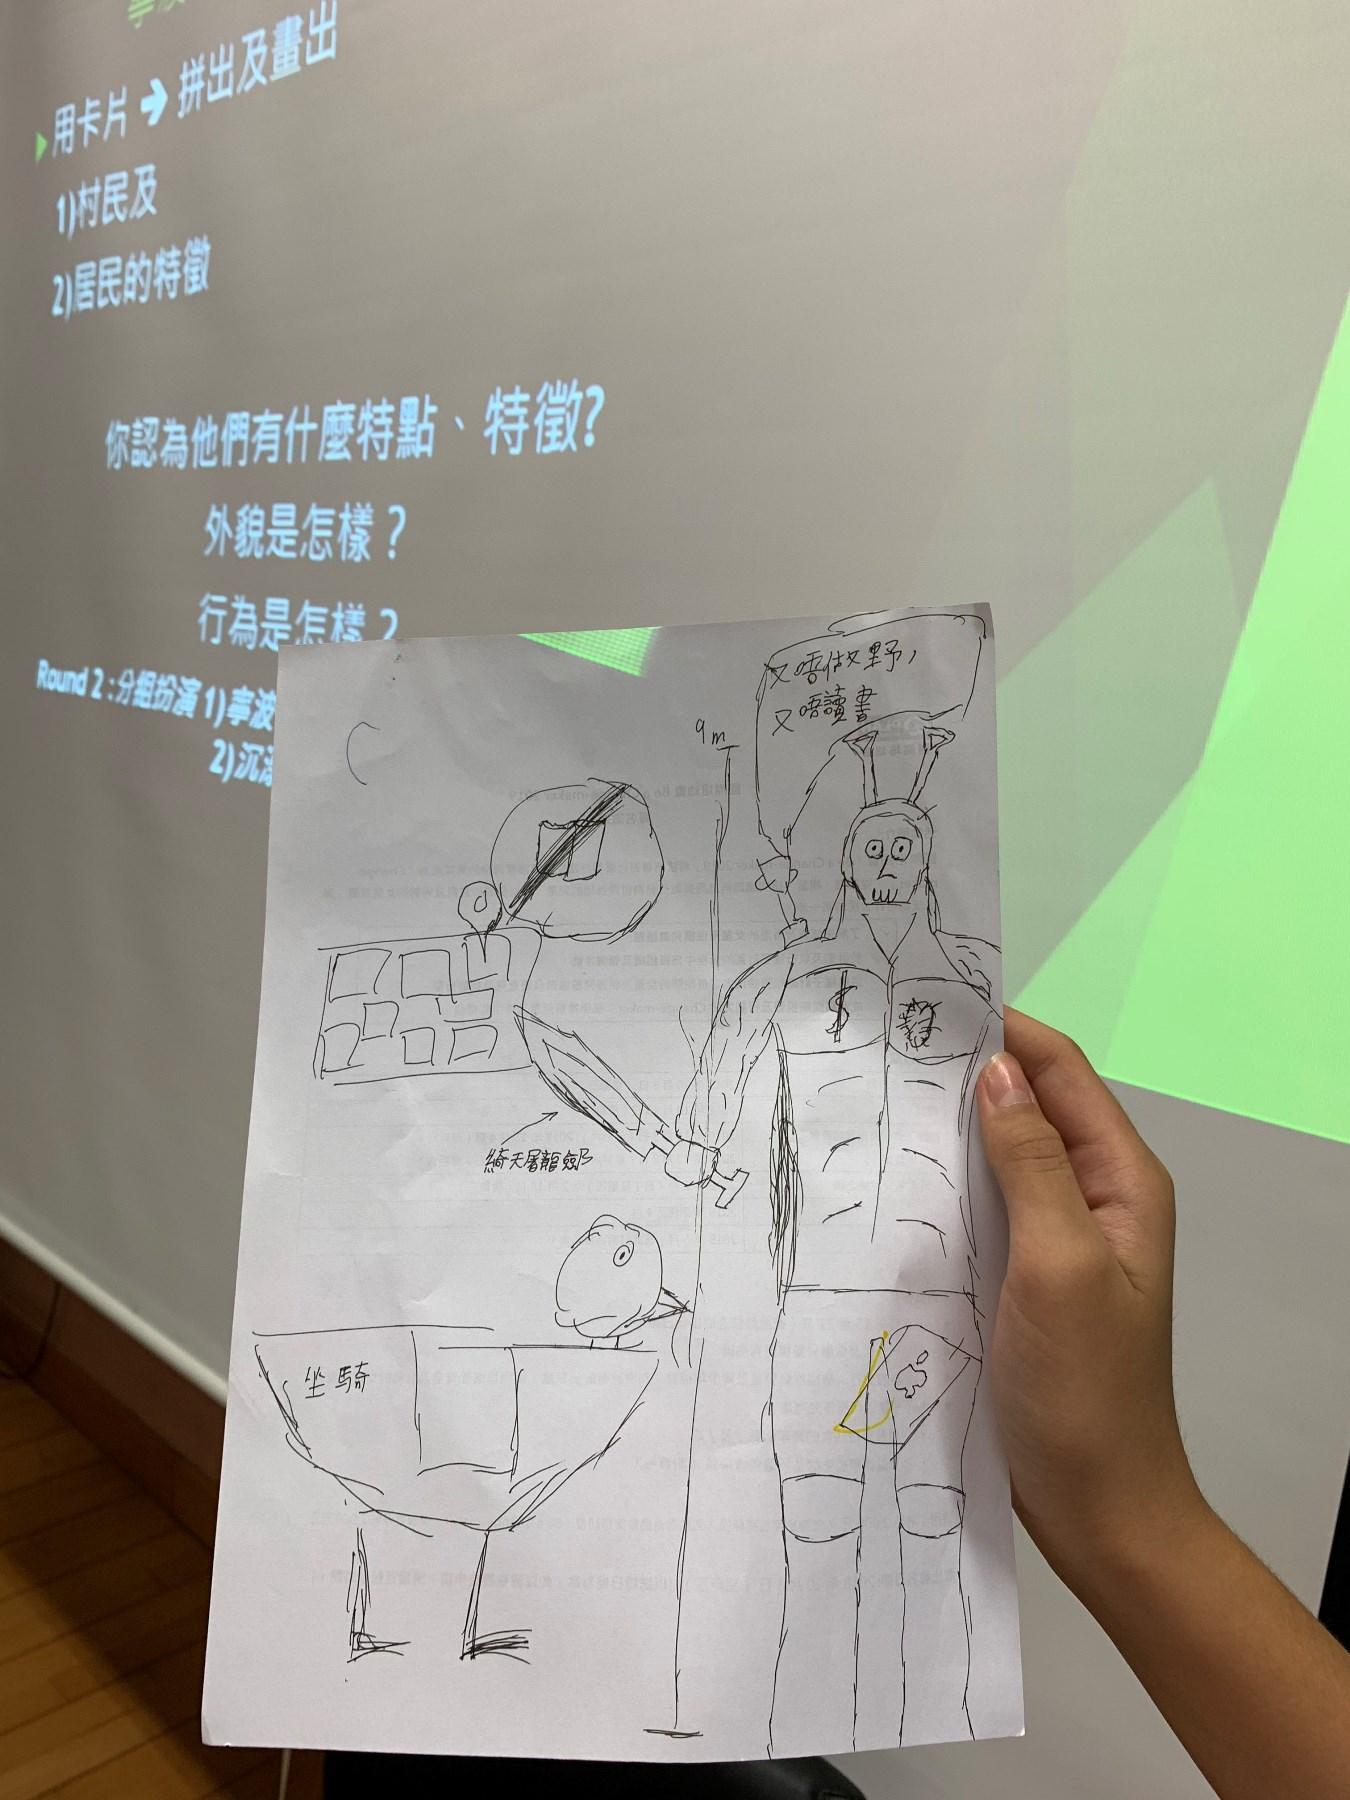 https://www.npc.edu.hk/sites/default/files/img_1504_3.jpg